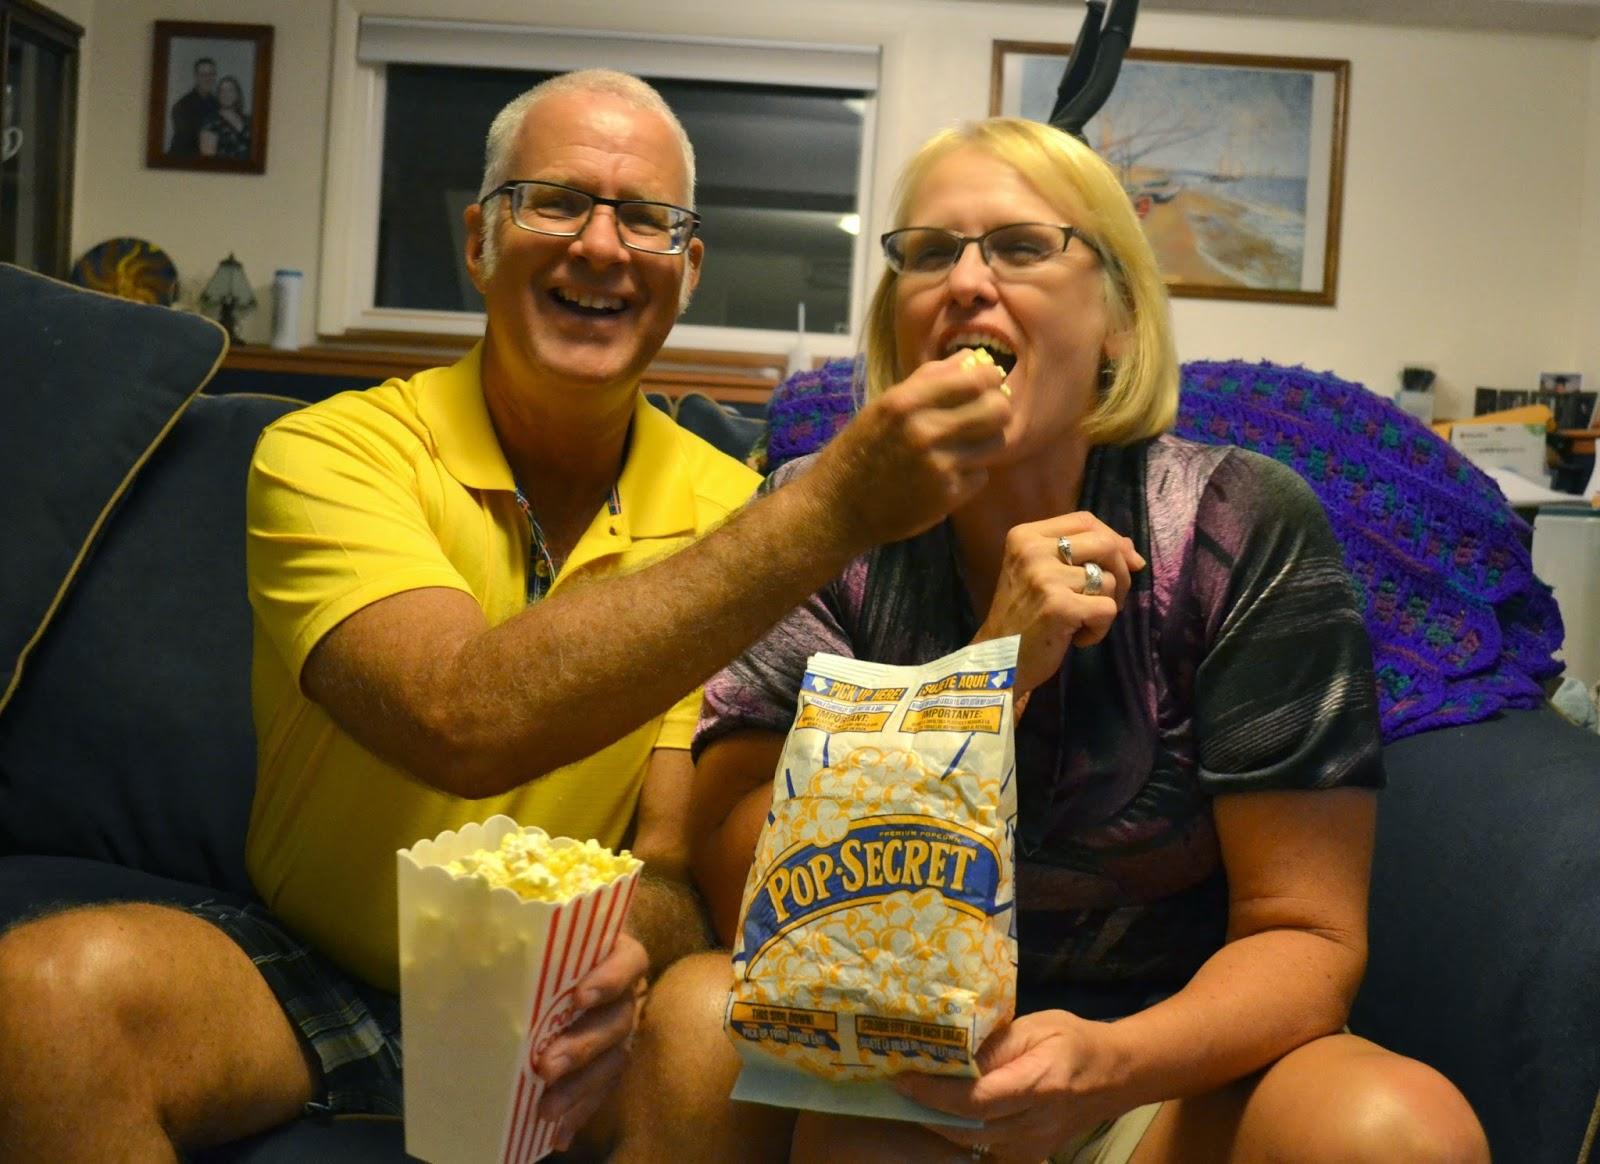 Pop Secret Popcorn Family Movie Night Popcorn, Pop Secret Perfect Pop, Pop Secret App, Perfect Pop App